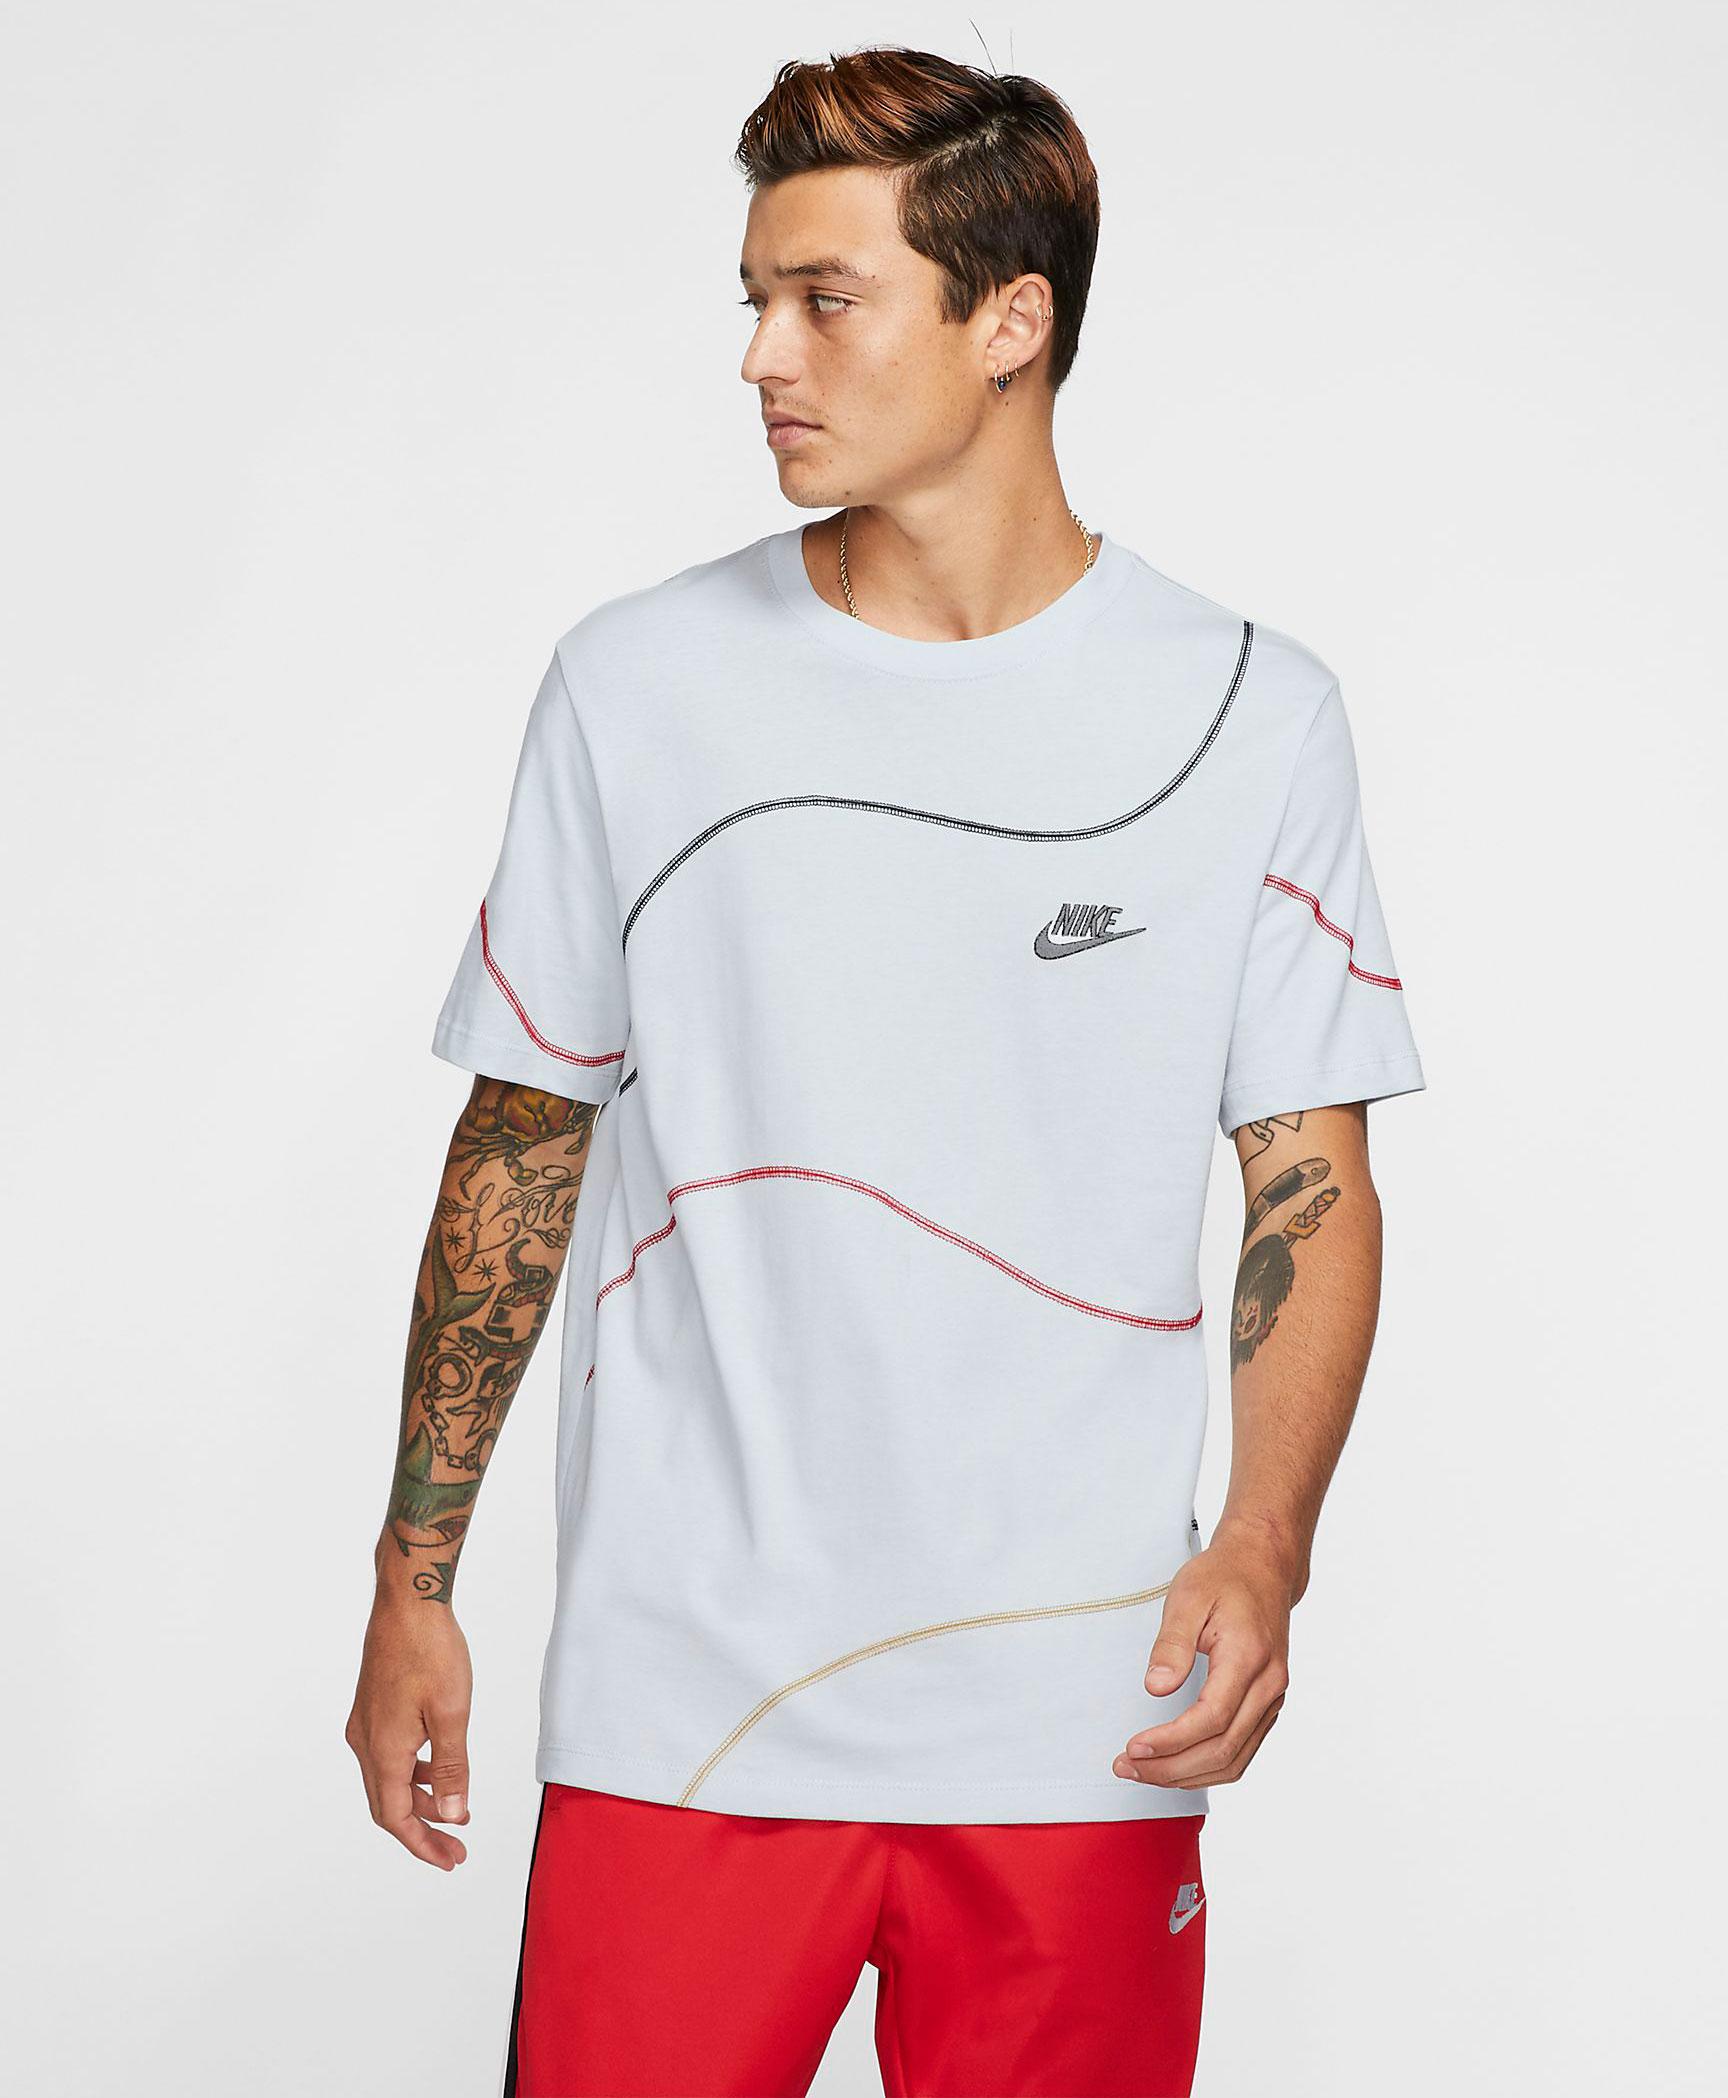 nike-air-max-inside-out-shirt-platinum